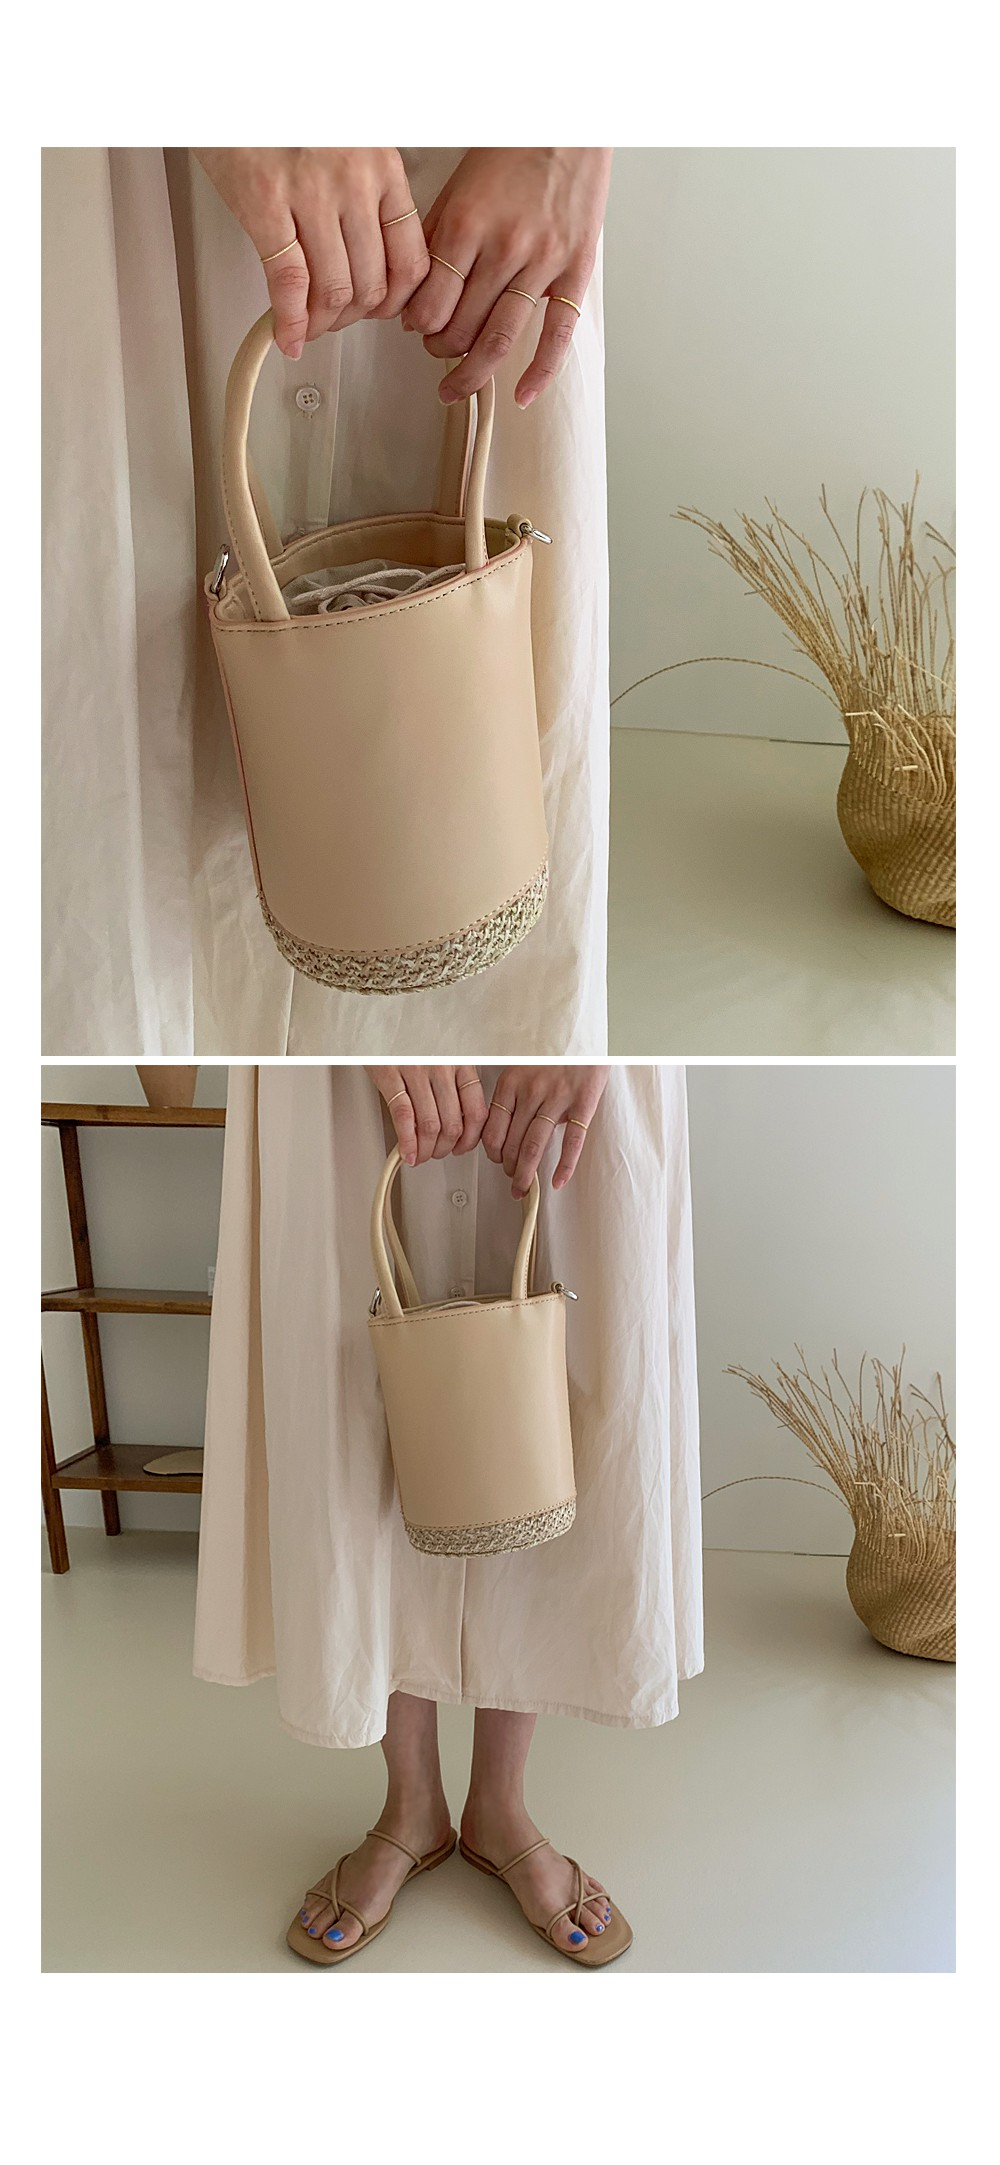 Pyratan cylindrical bag